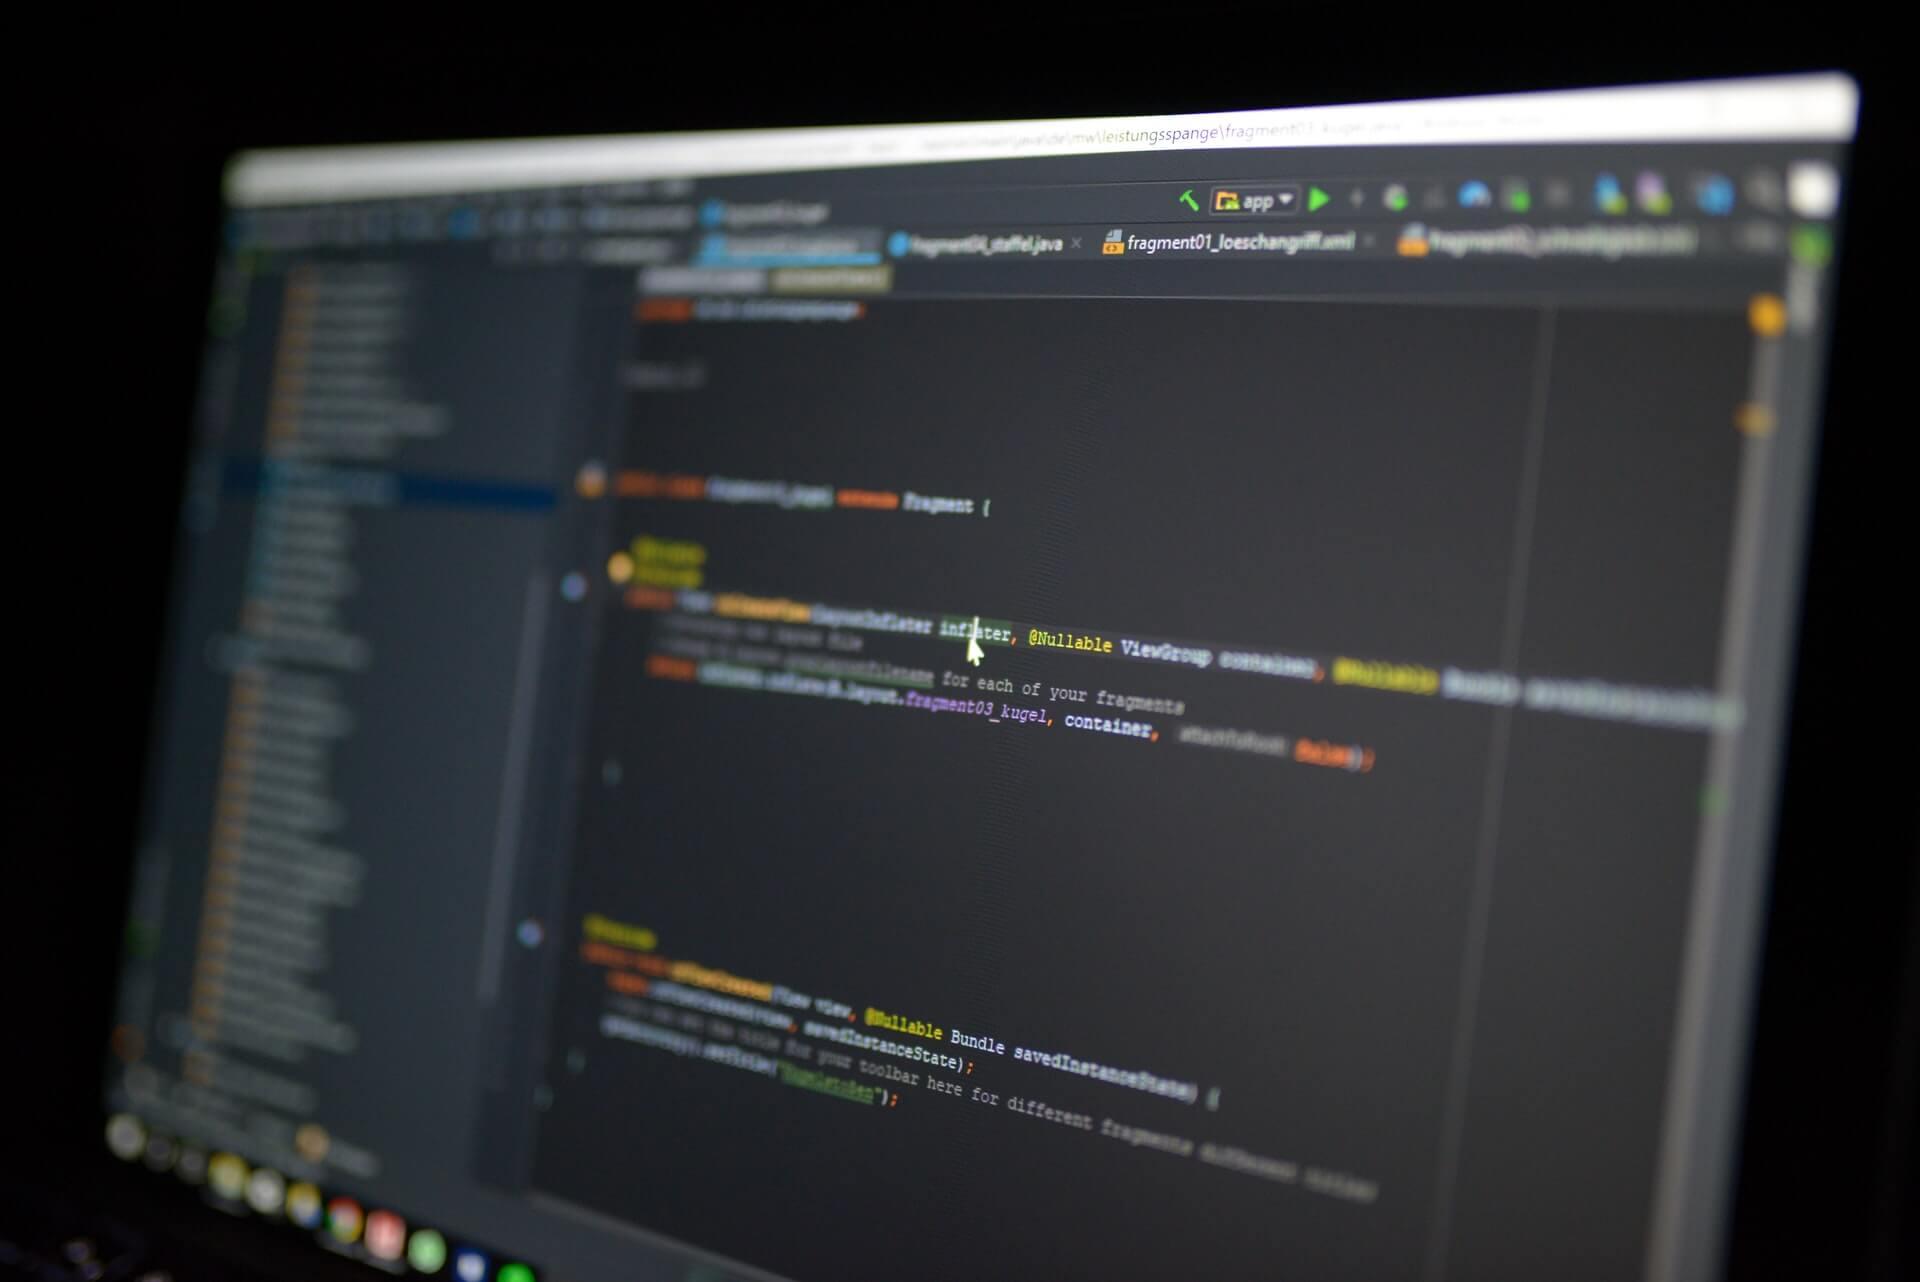 Java language to Start in Development